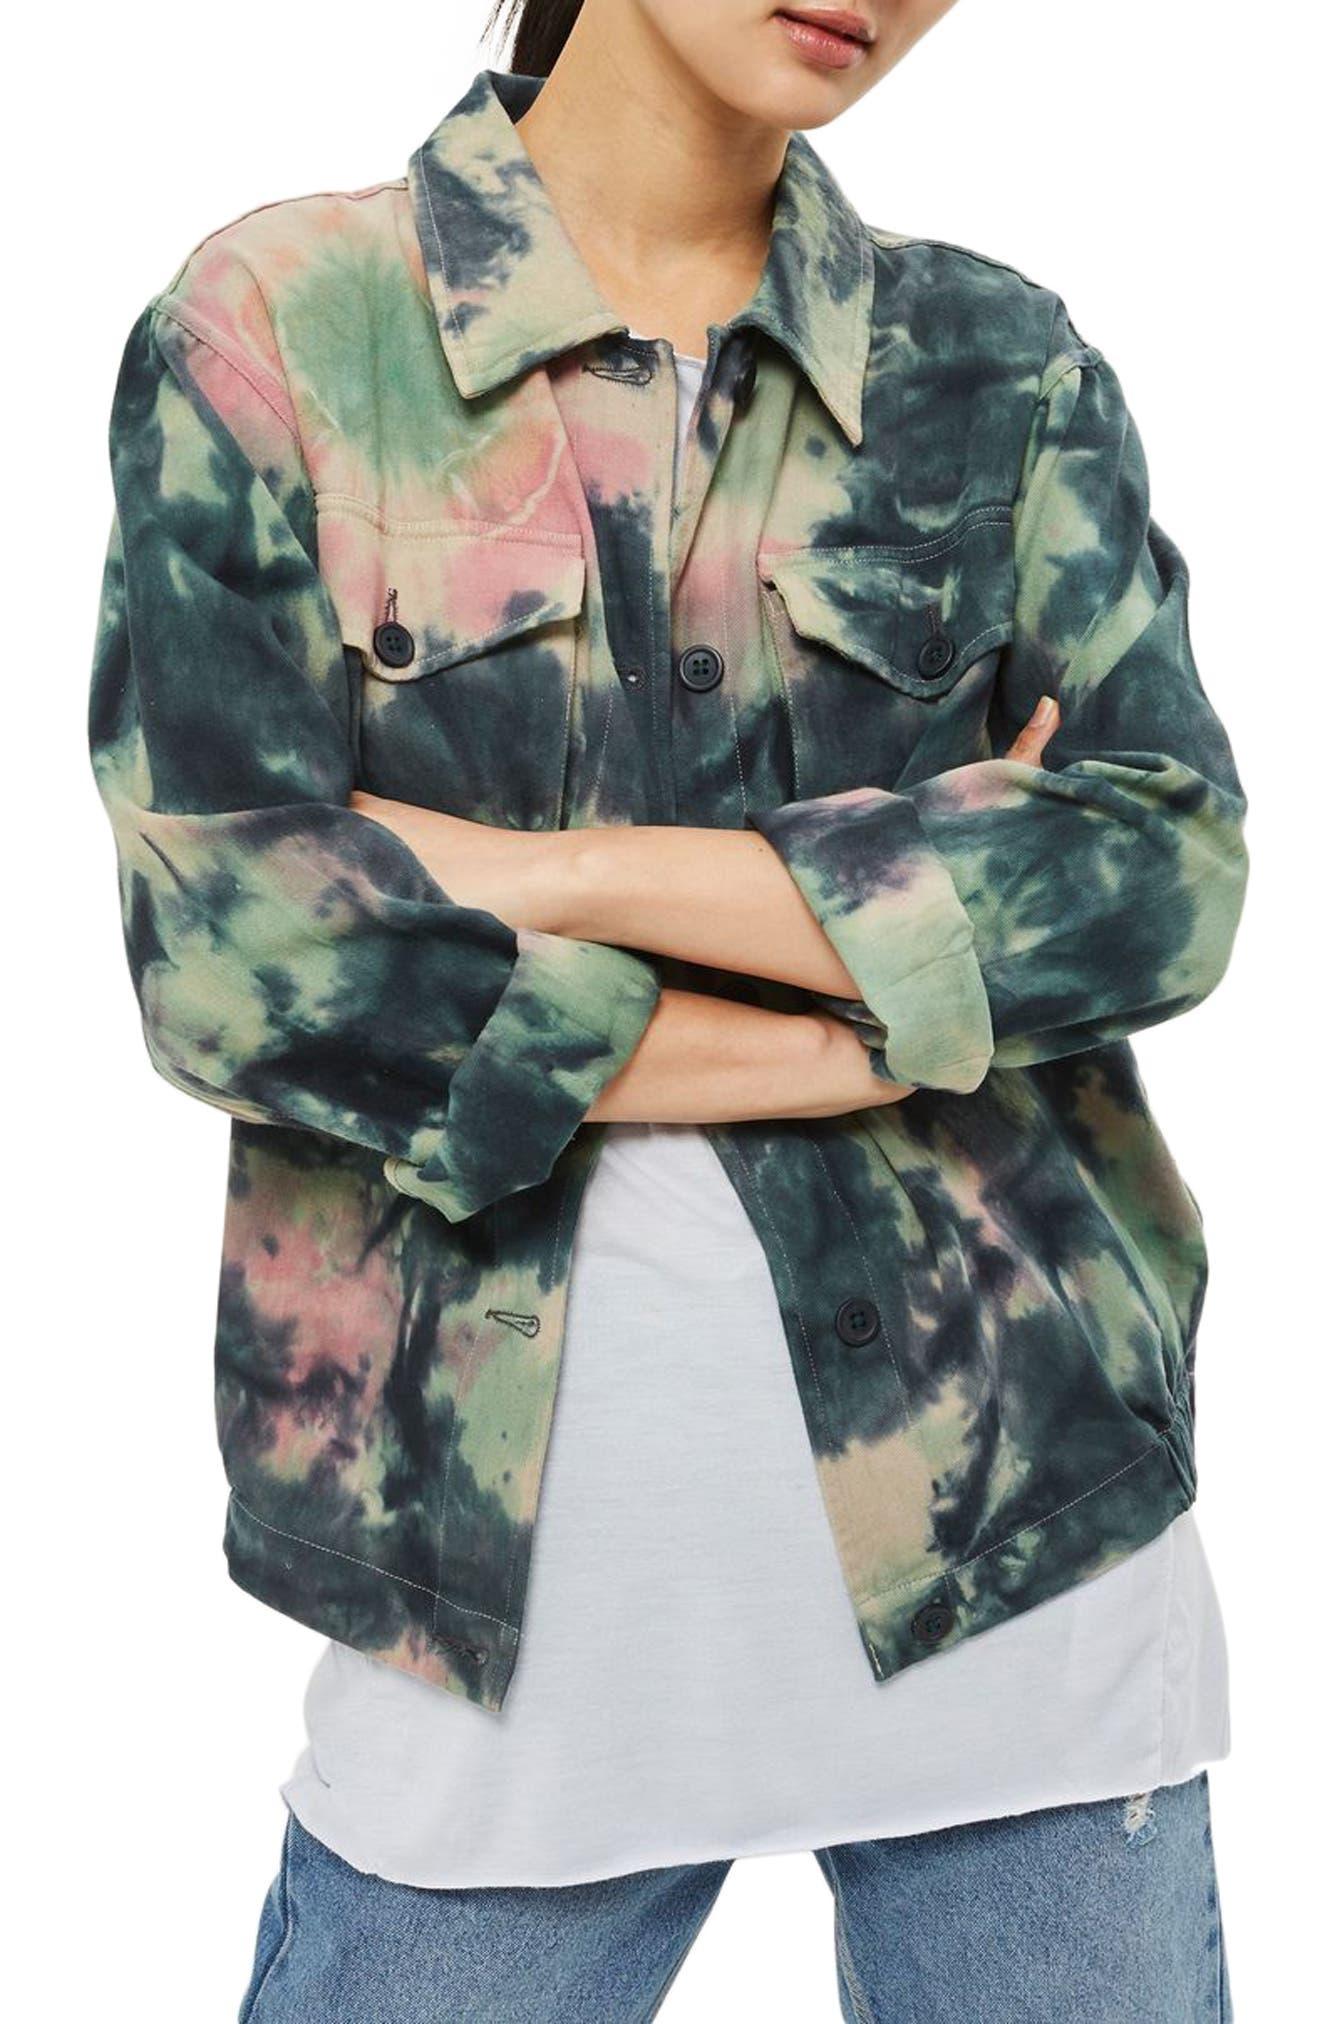 Topshop Tie-Dye Shirt Jacket